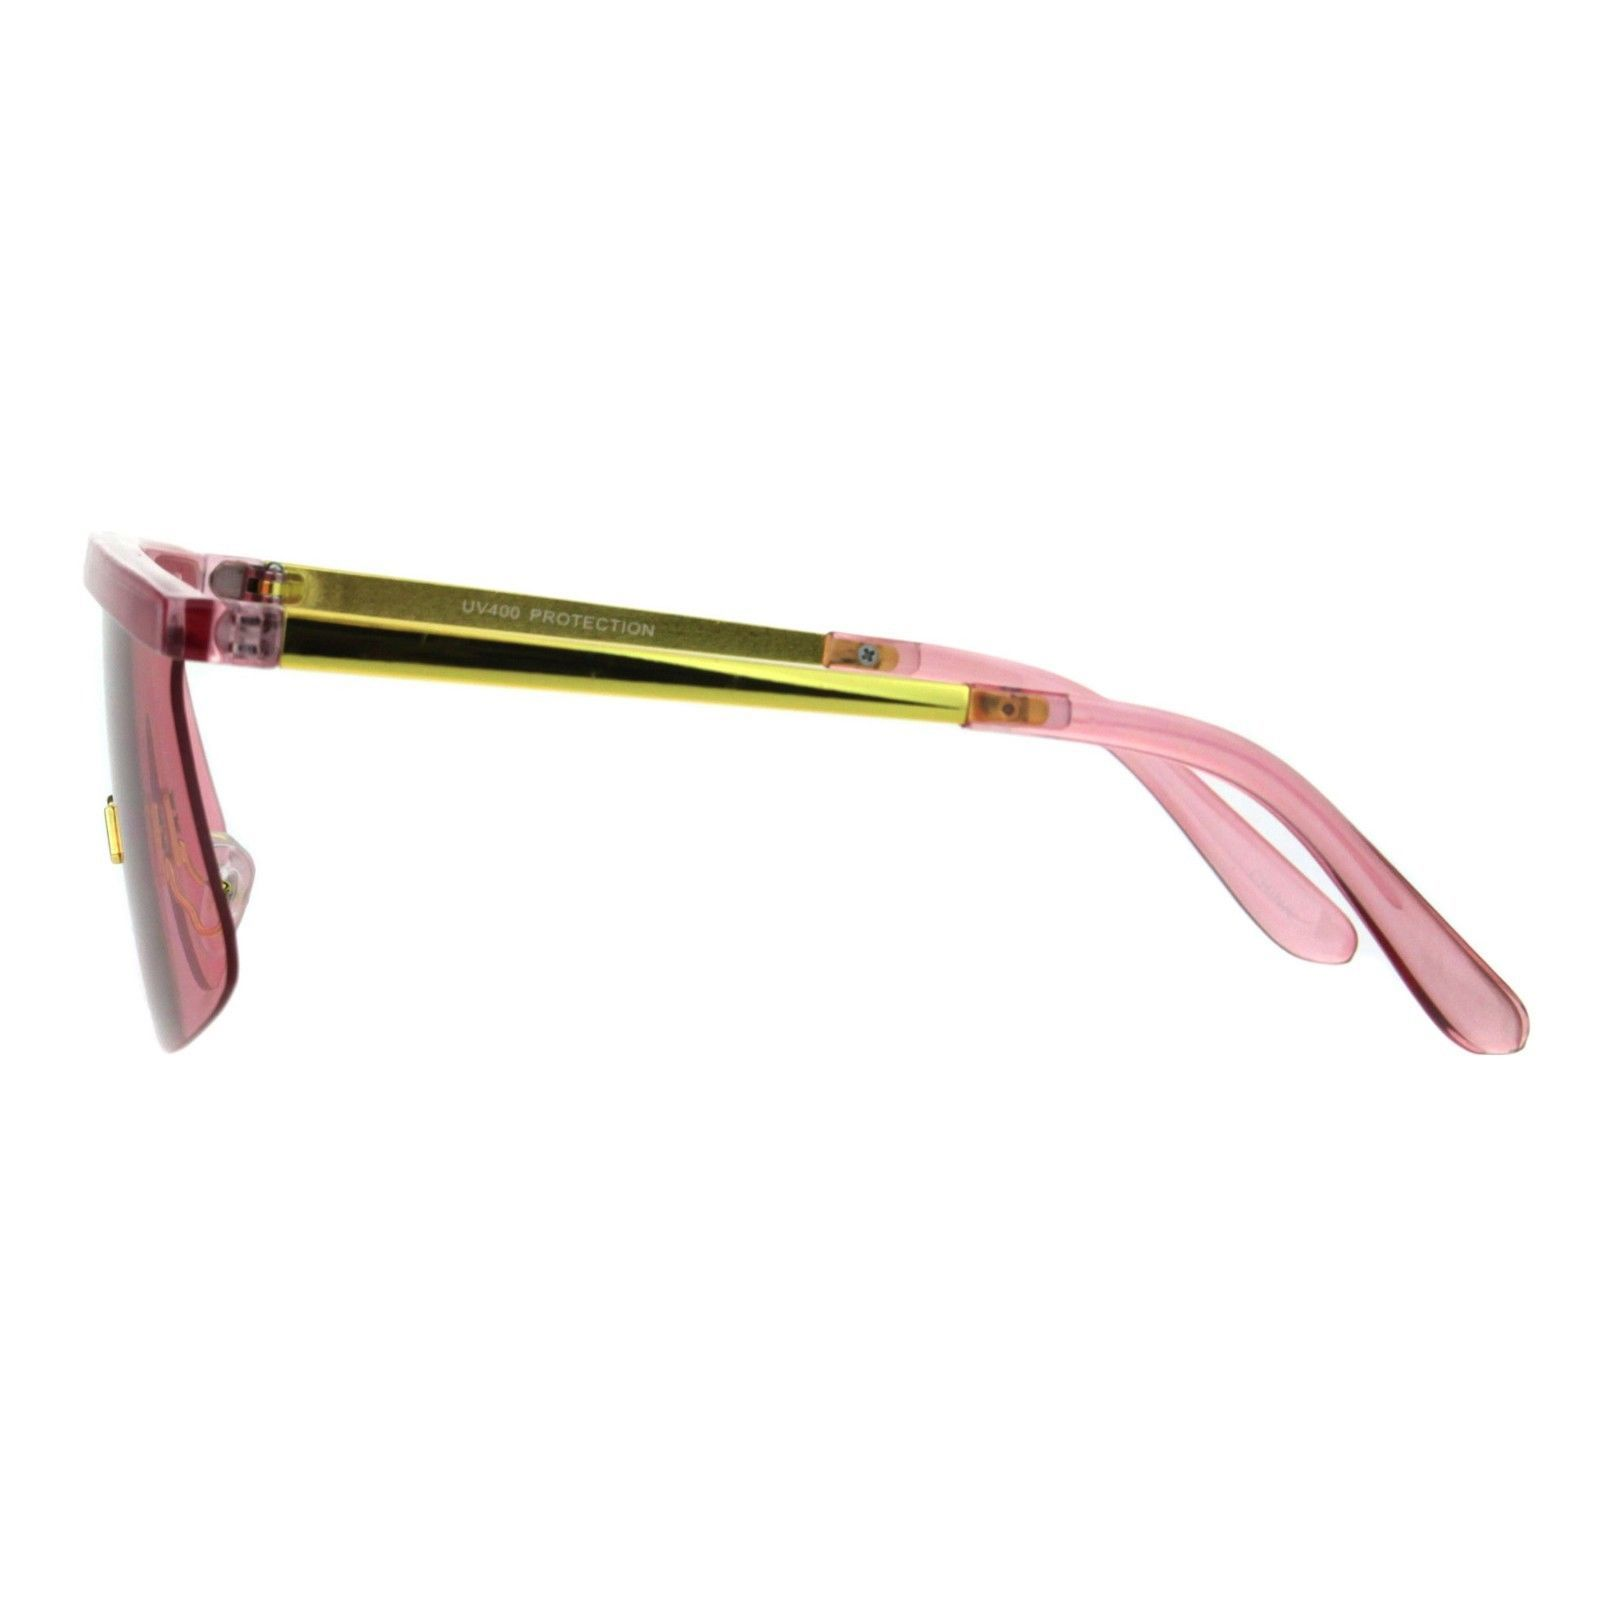 Vintage Goggle Style Sunglasses 80's Fashion Half Rim Shield Shades UV 400